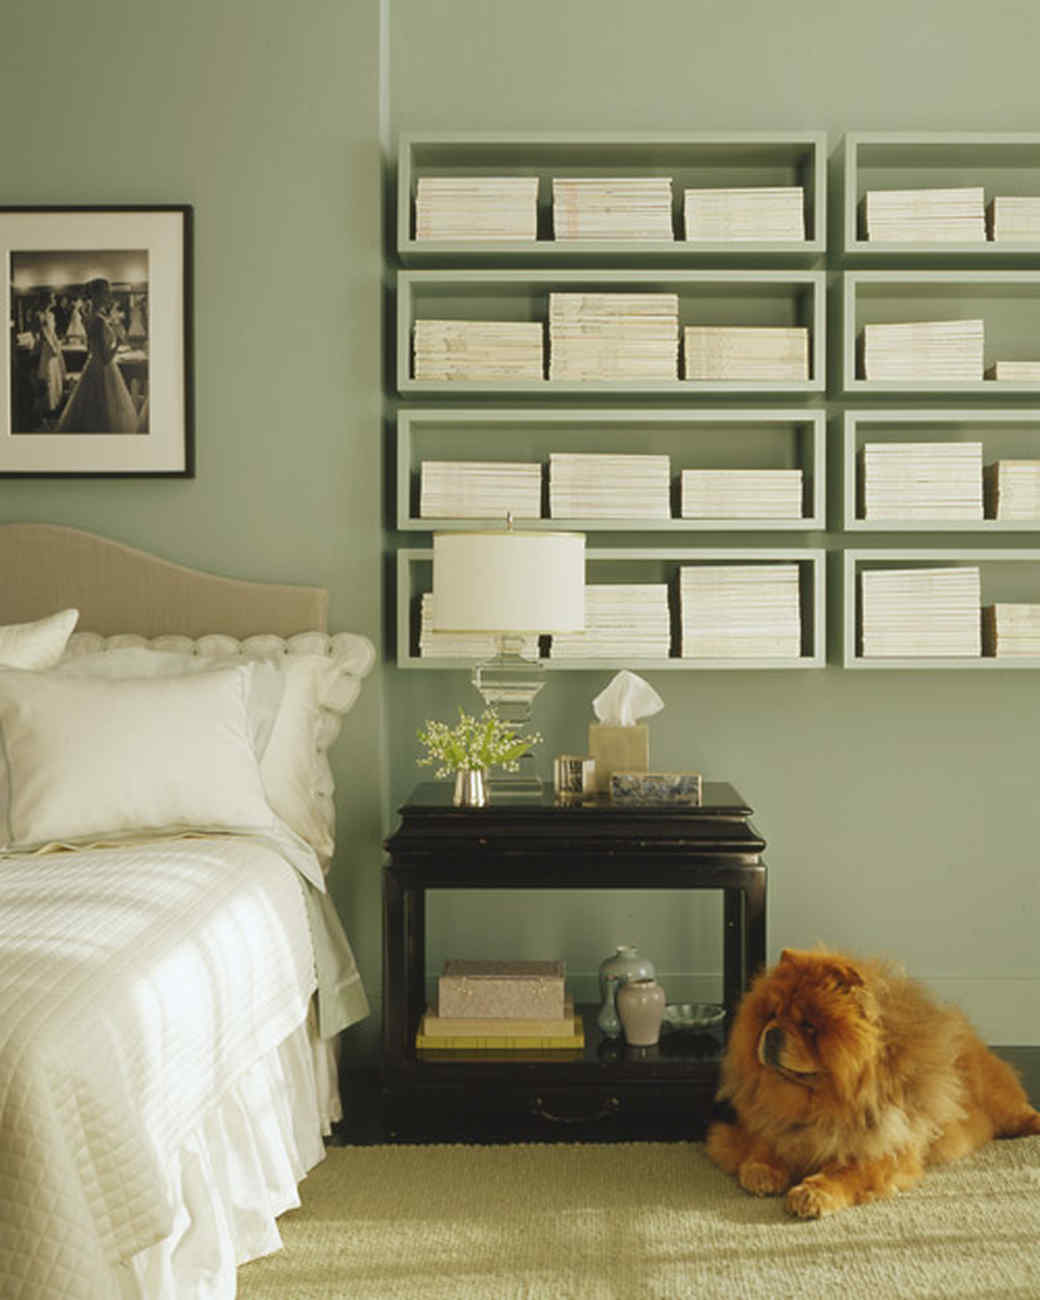 Wall decor for bedroom walls ideas